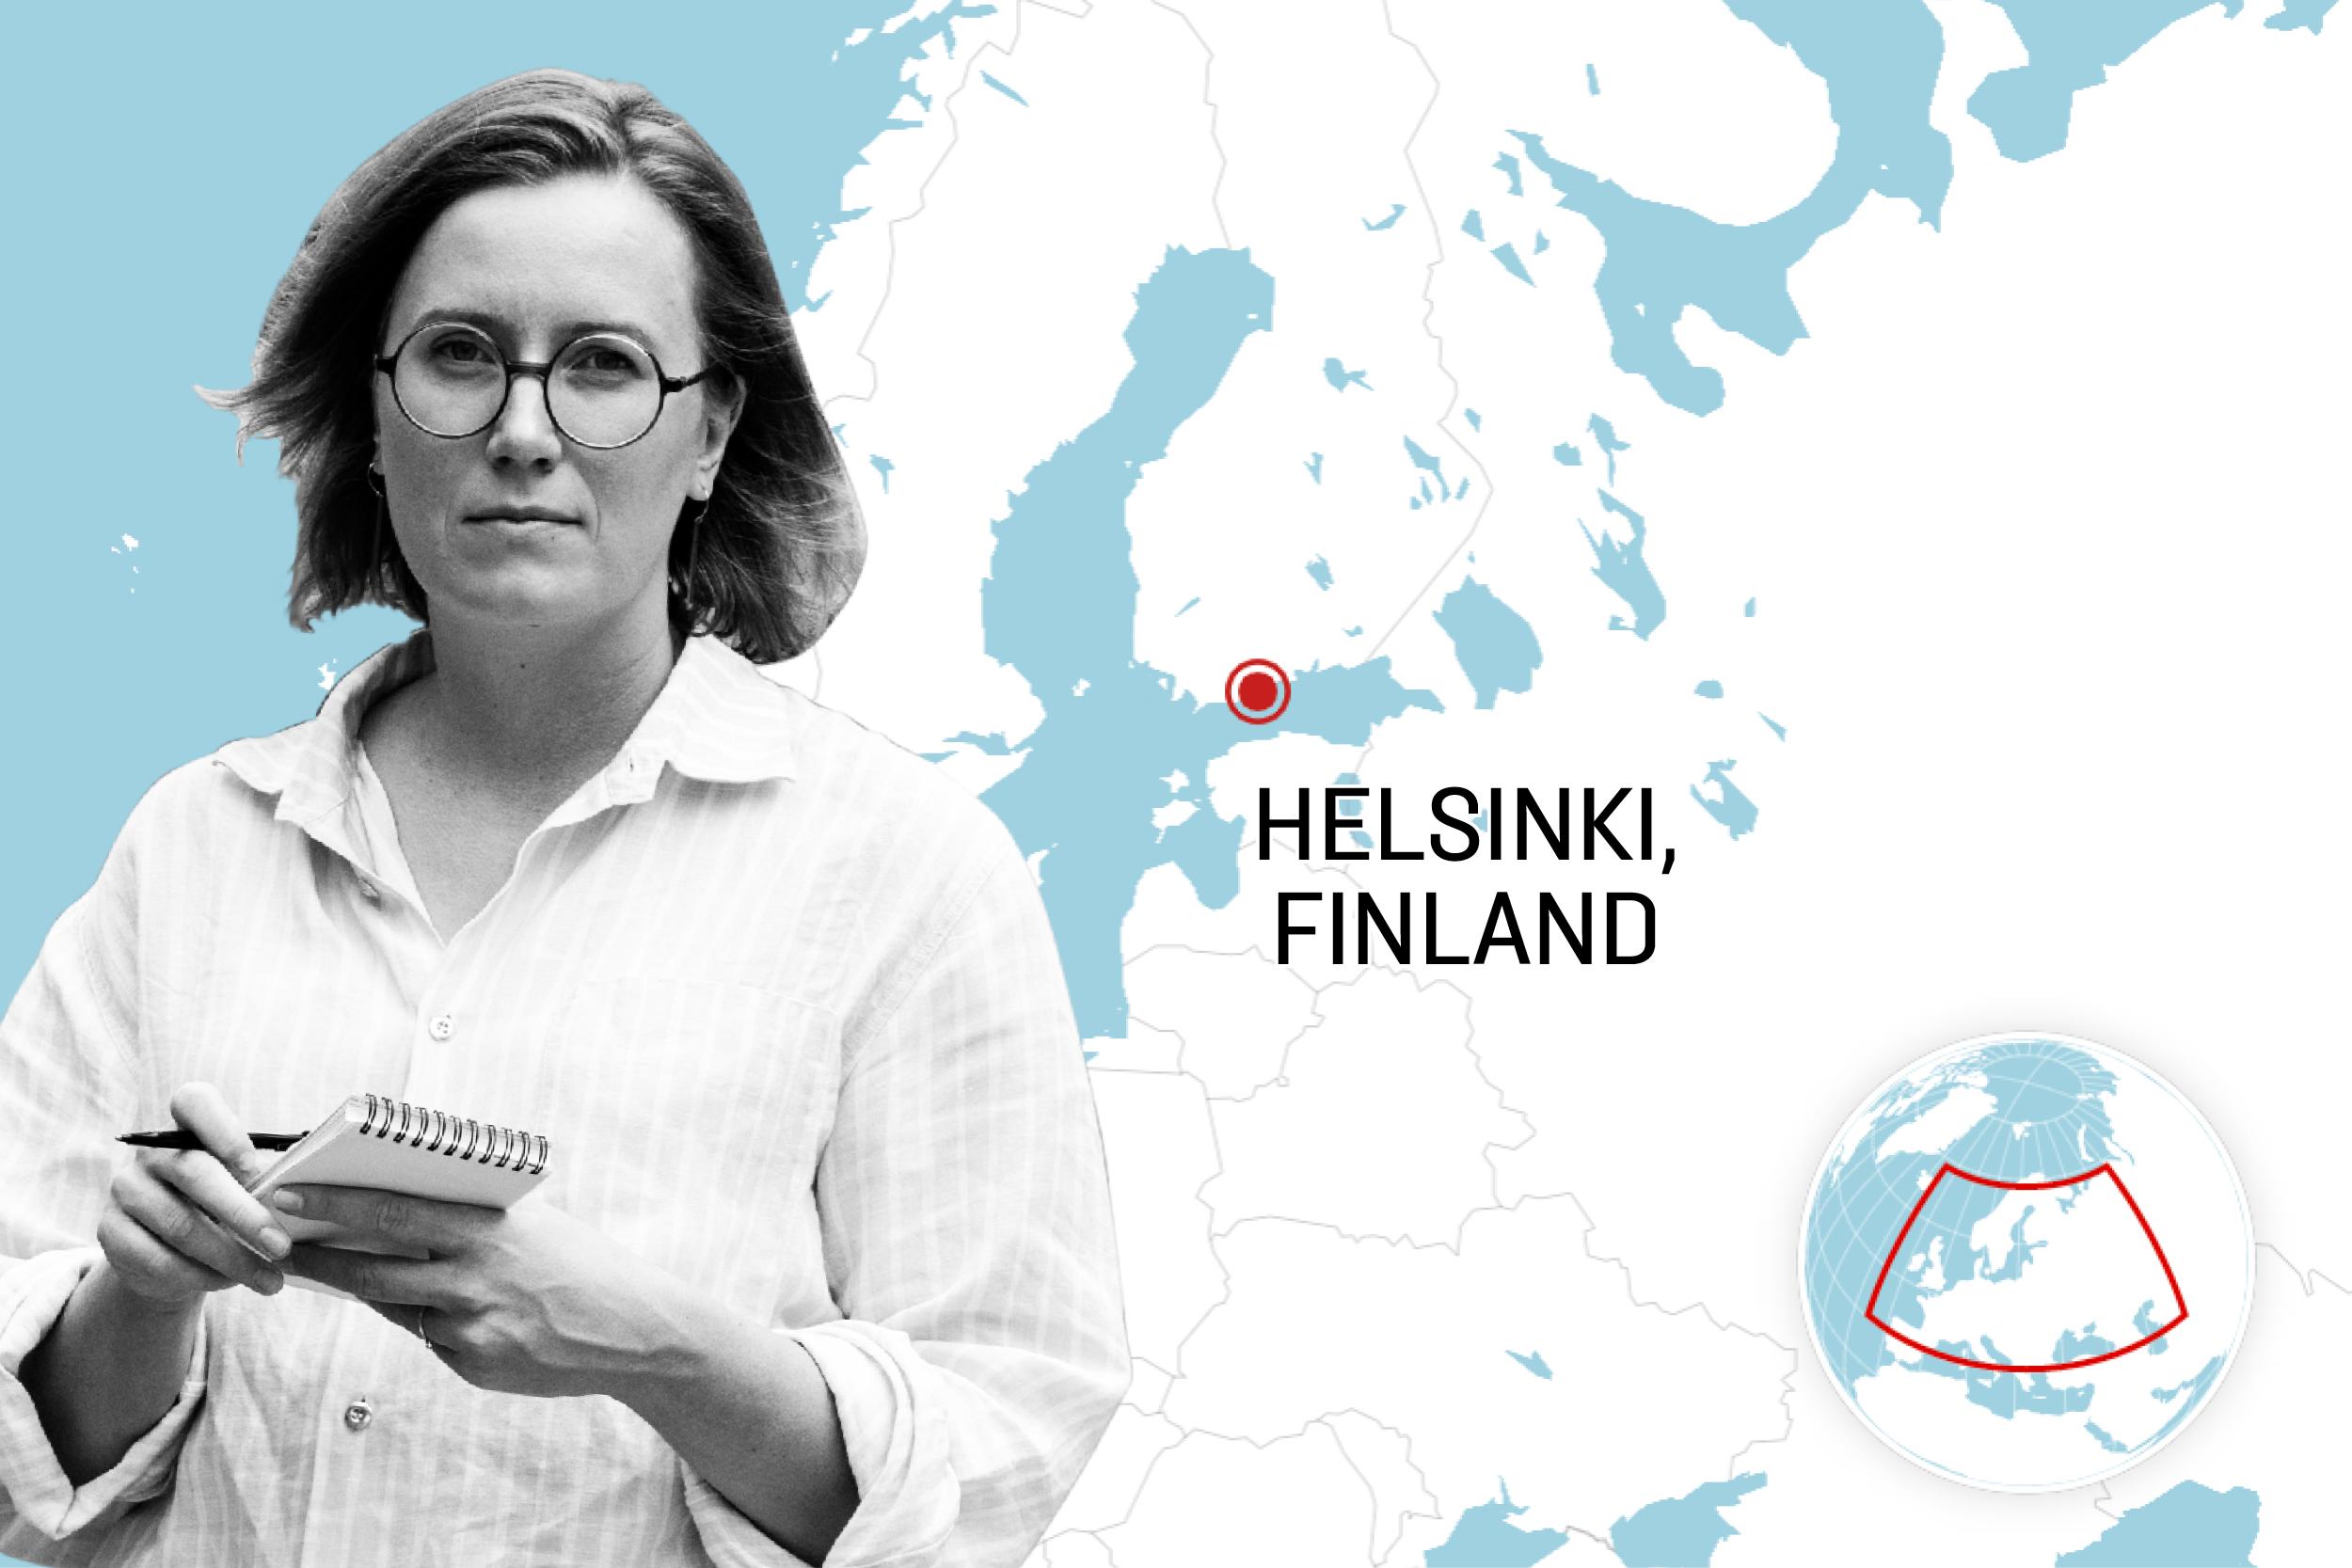 Anna-Sofia Berner, U.S. correspondent for Helsingin Sanomat.